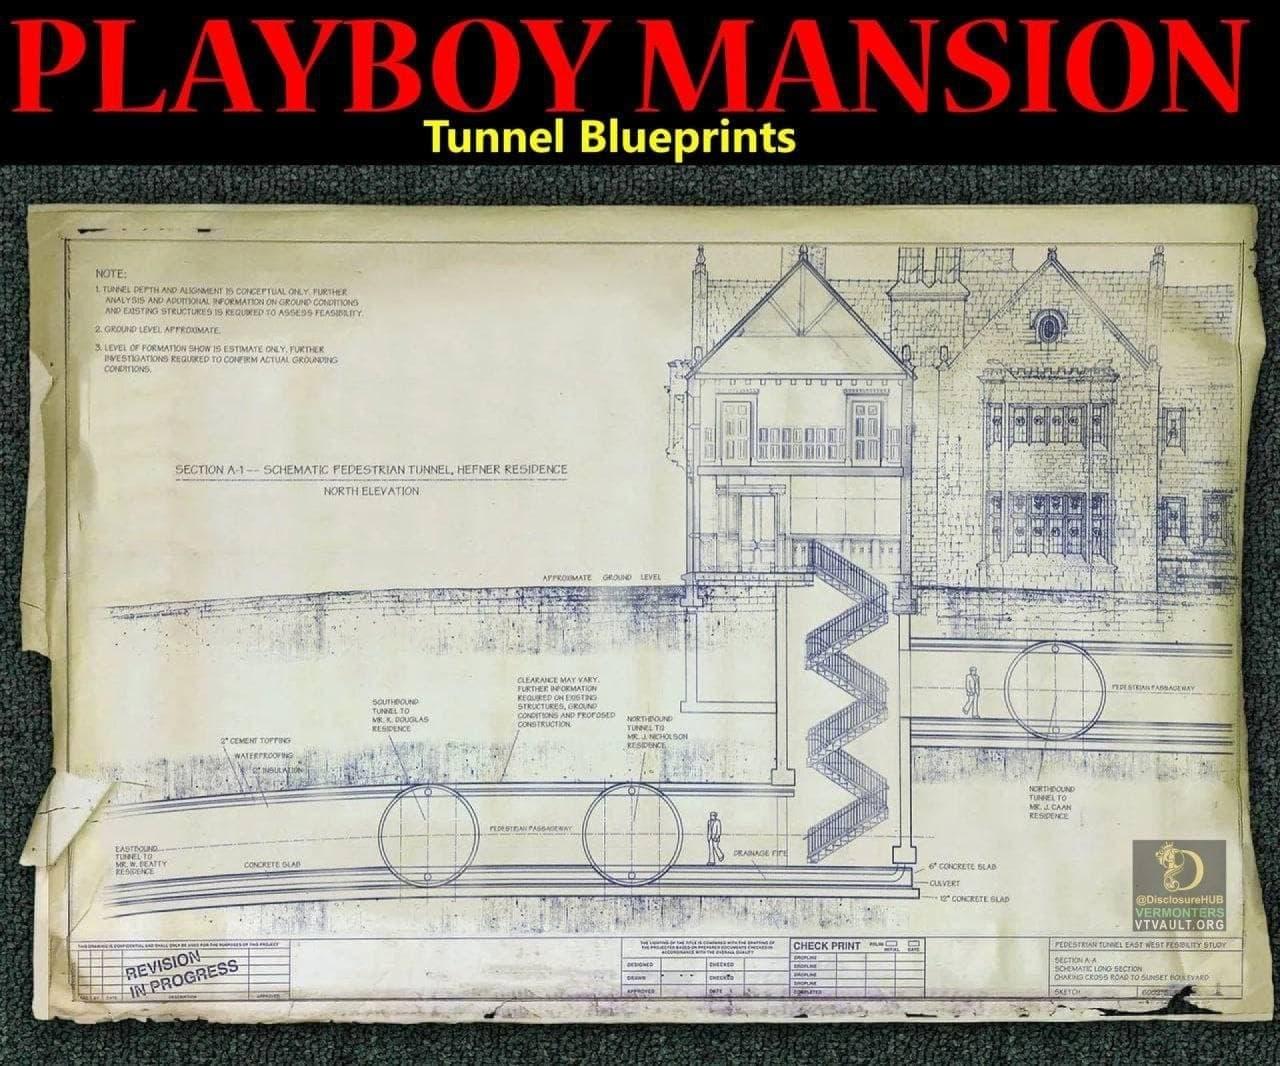 play boy mansion _2021-09-28_23-47-33.jpg